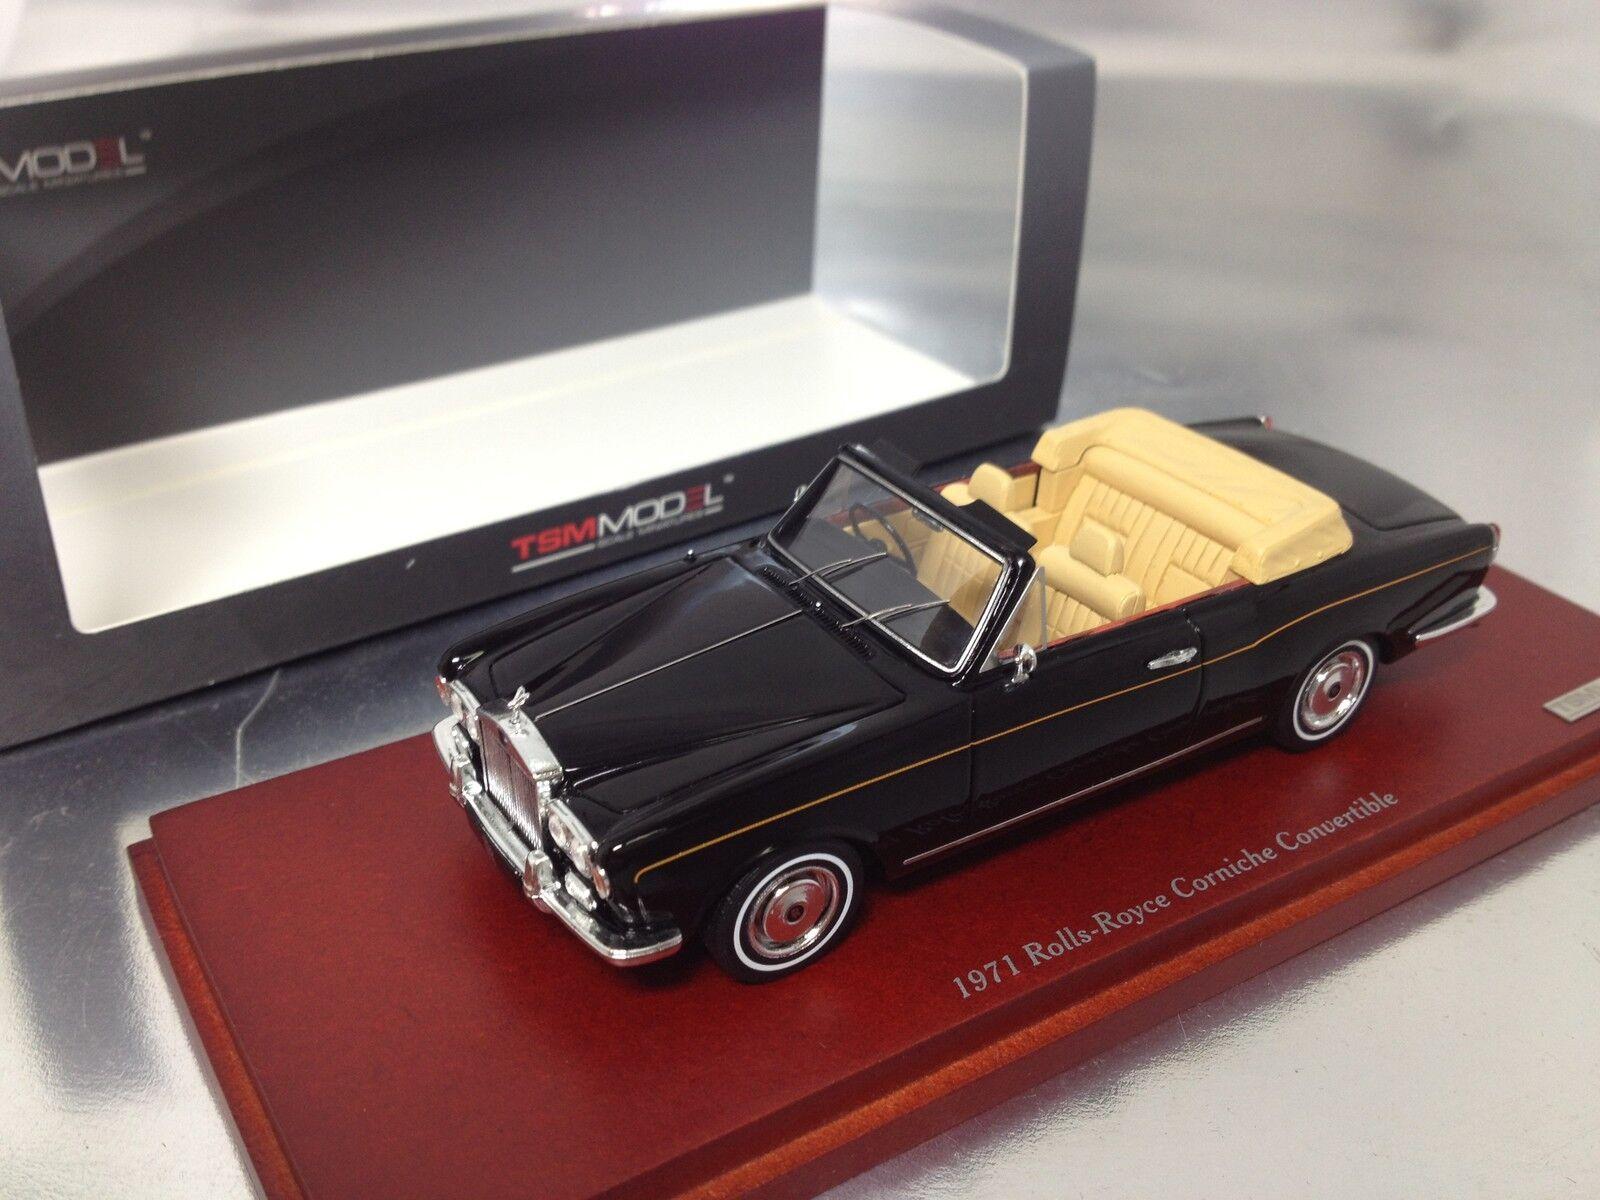 1 43 TSM  TSM134345 Rolls-Royce 1971 Corniche cabriolet noir